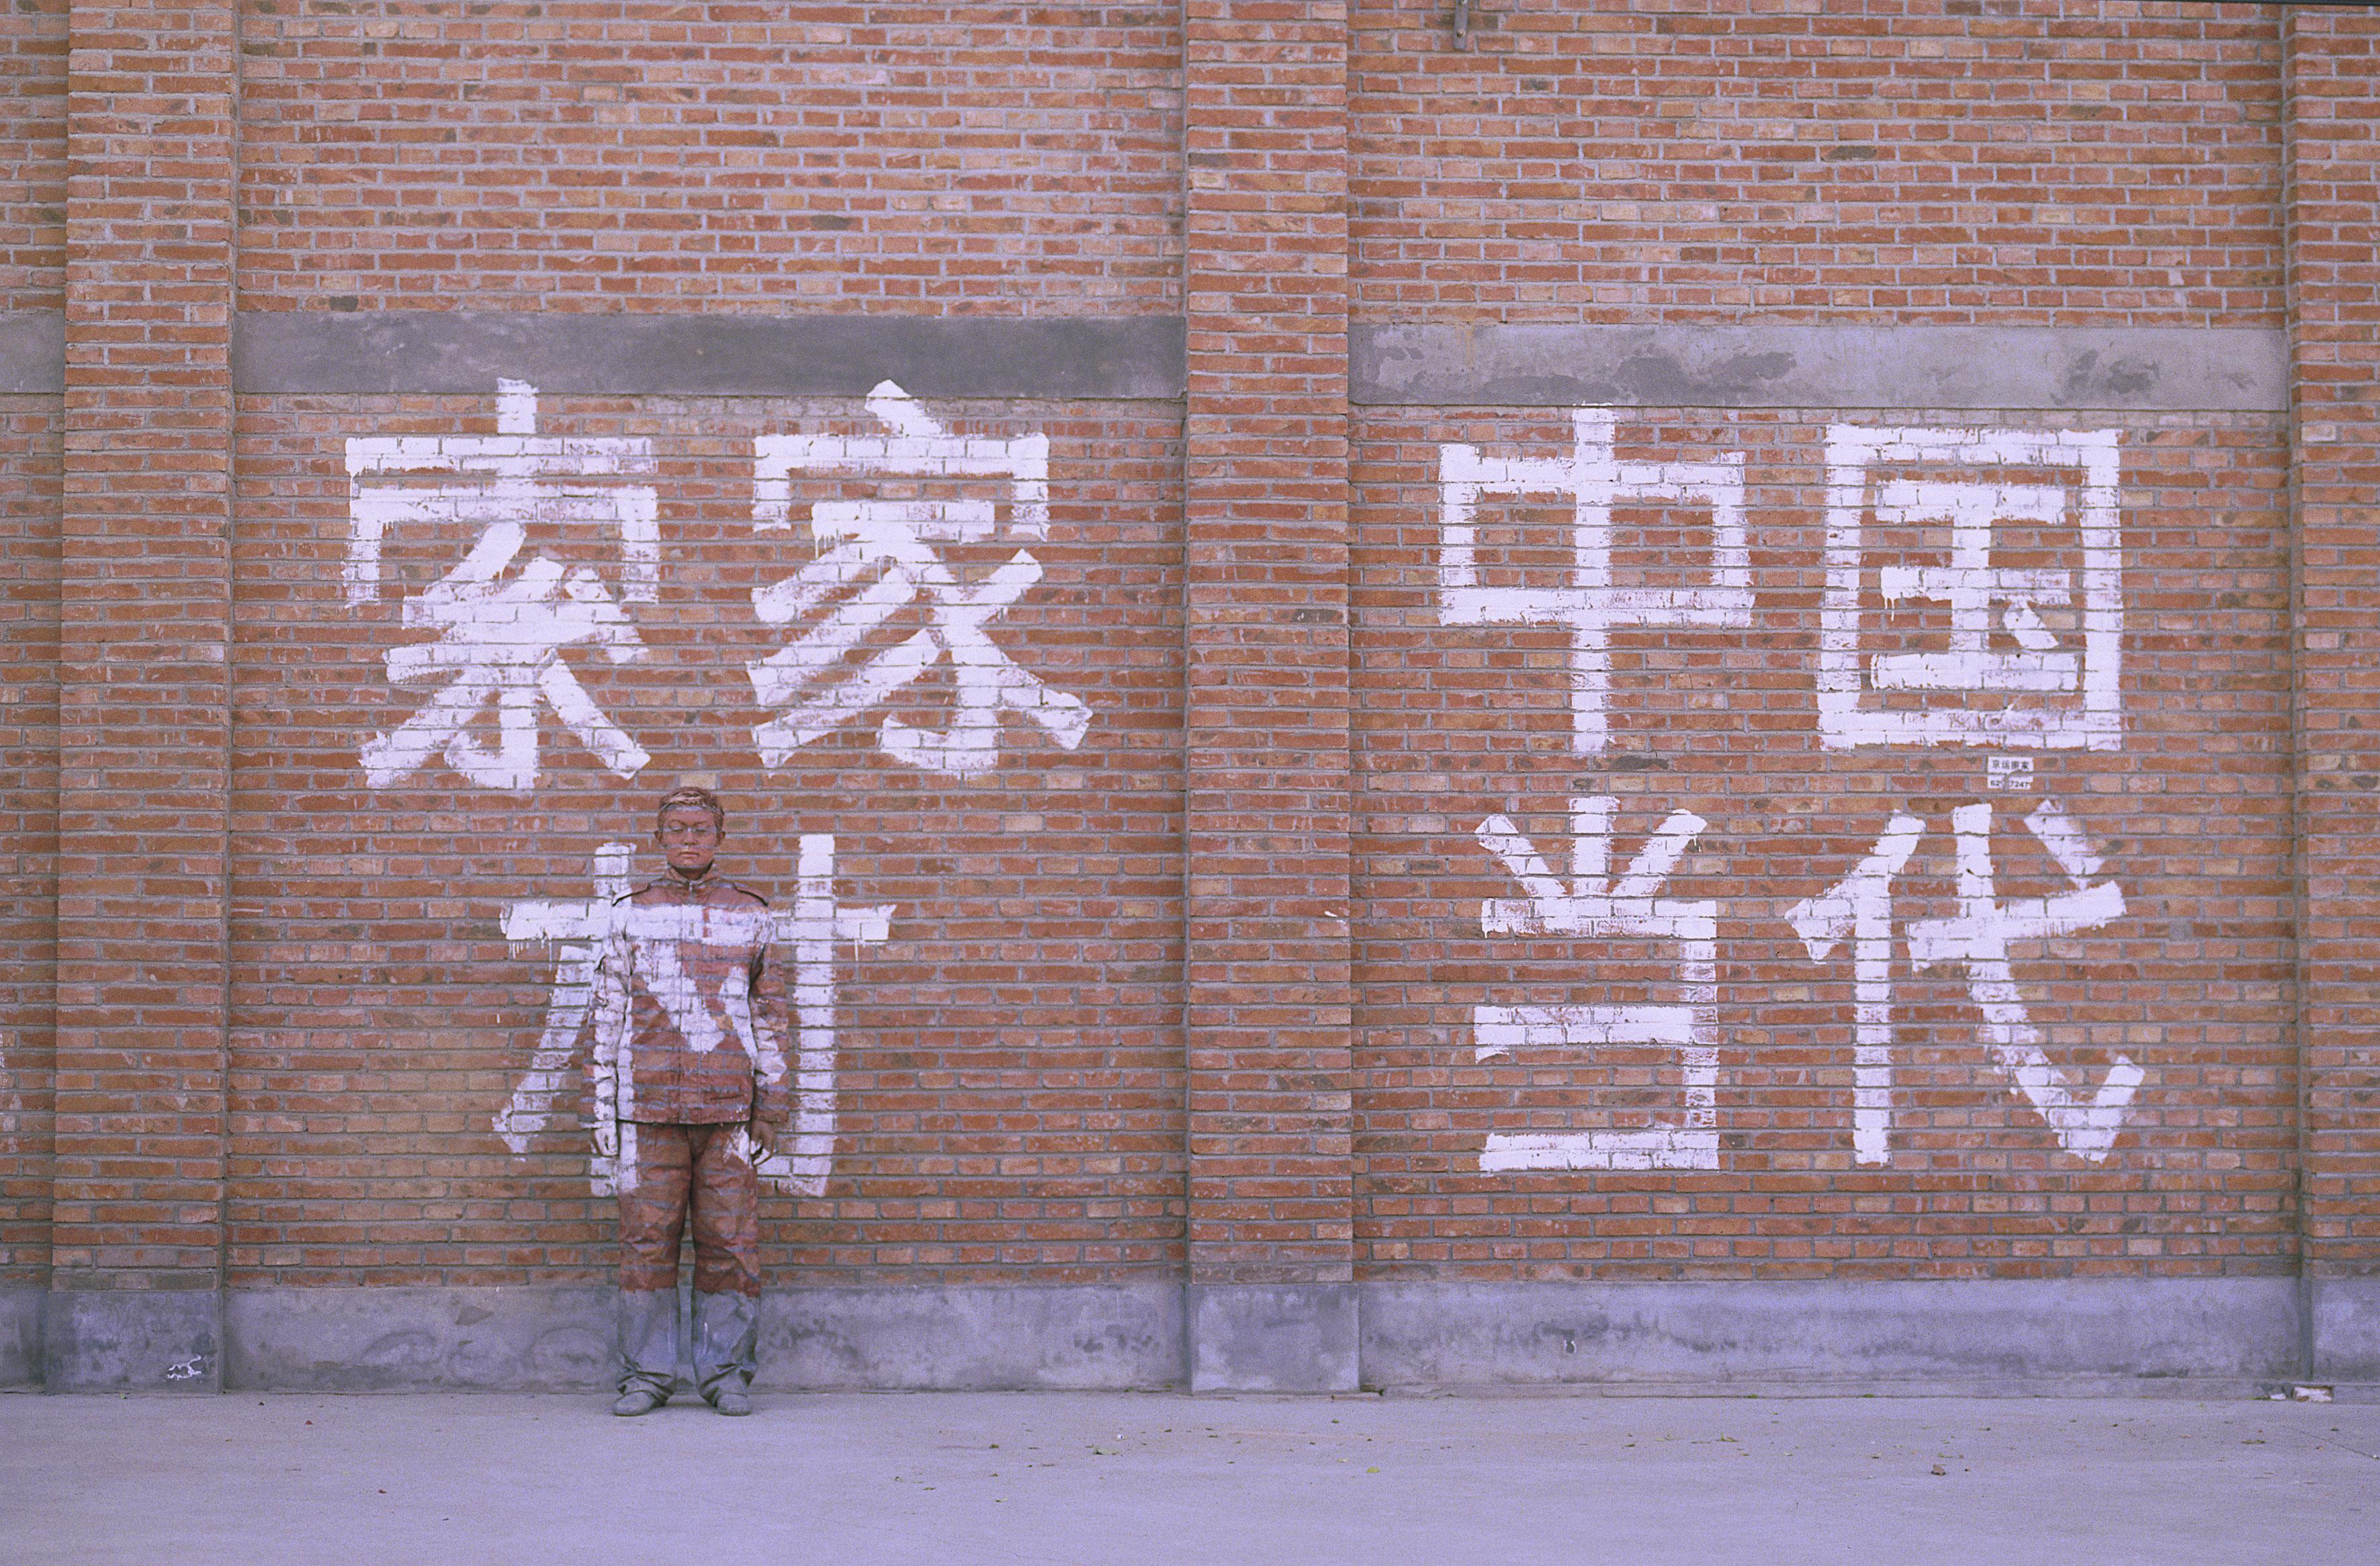 Liu_Bolin_HITC_No.4_Chinese_Contemporary_105x160cm_photo_2006